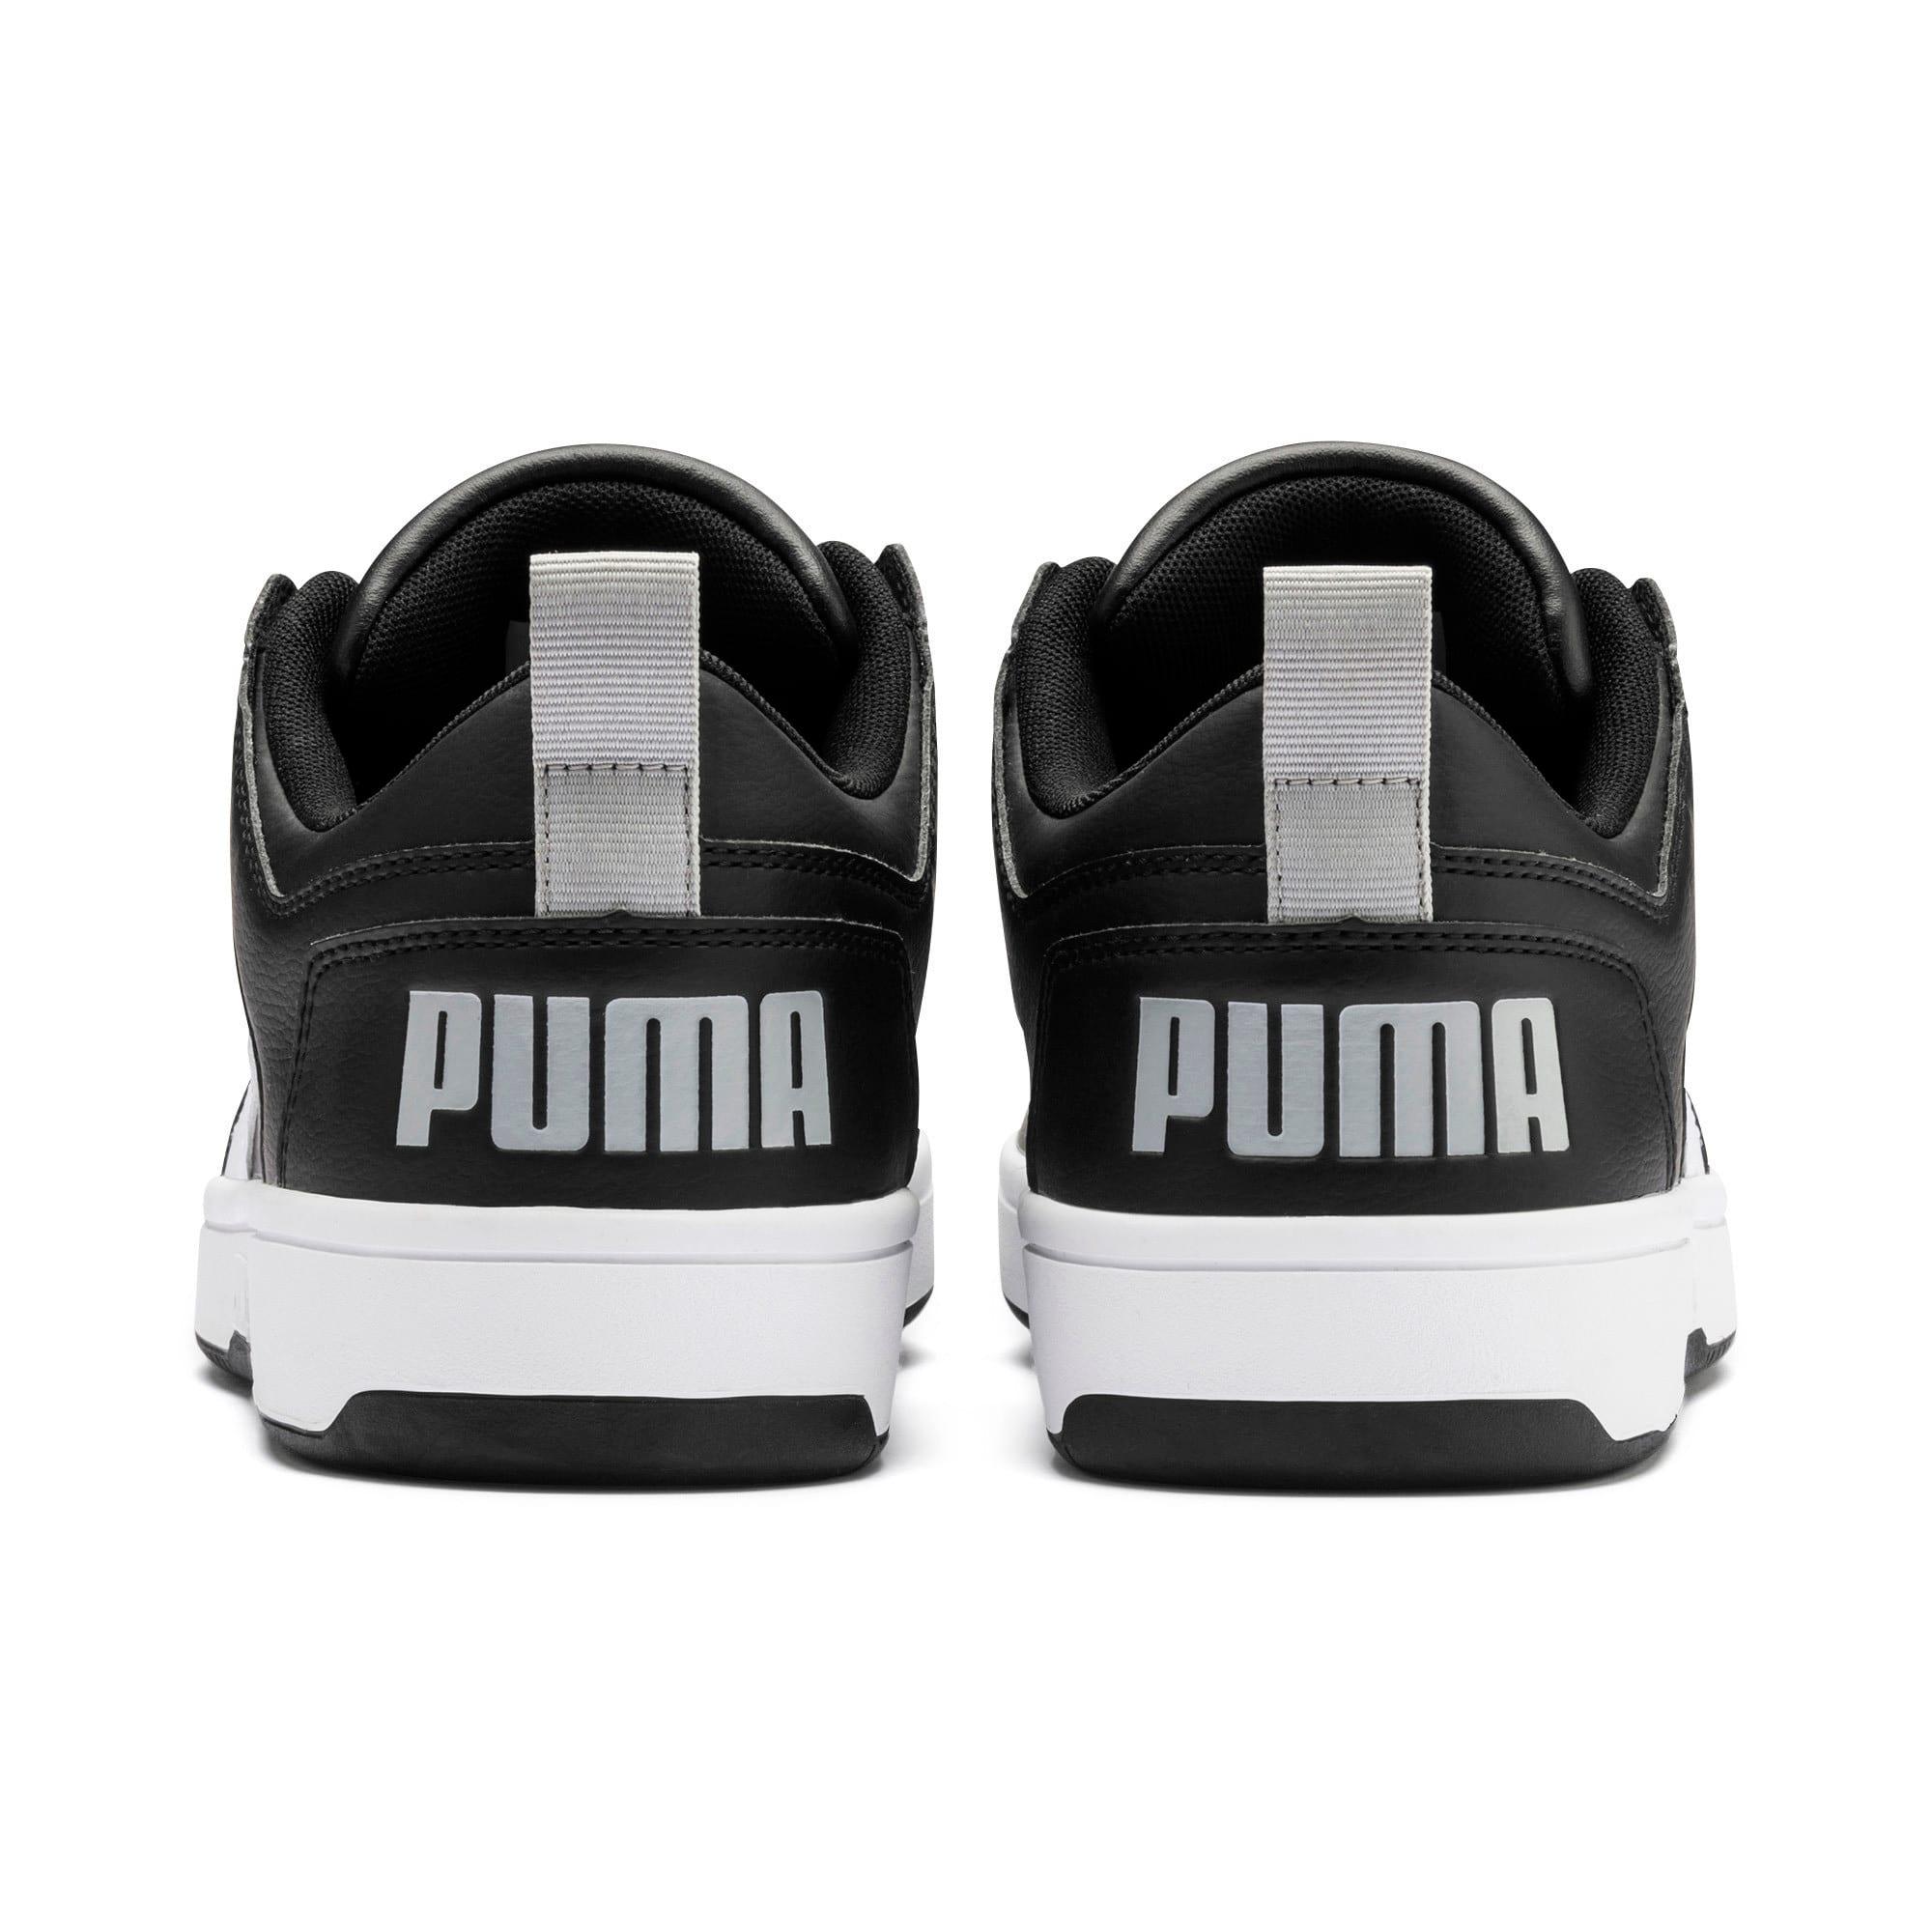 Thumbnail 4 of PUMA Rebound LayUp Lo Sneakers, Puma Black-White-High Rise, medium